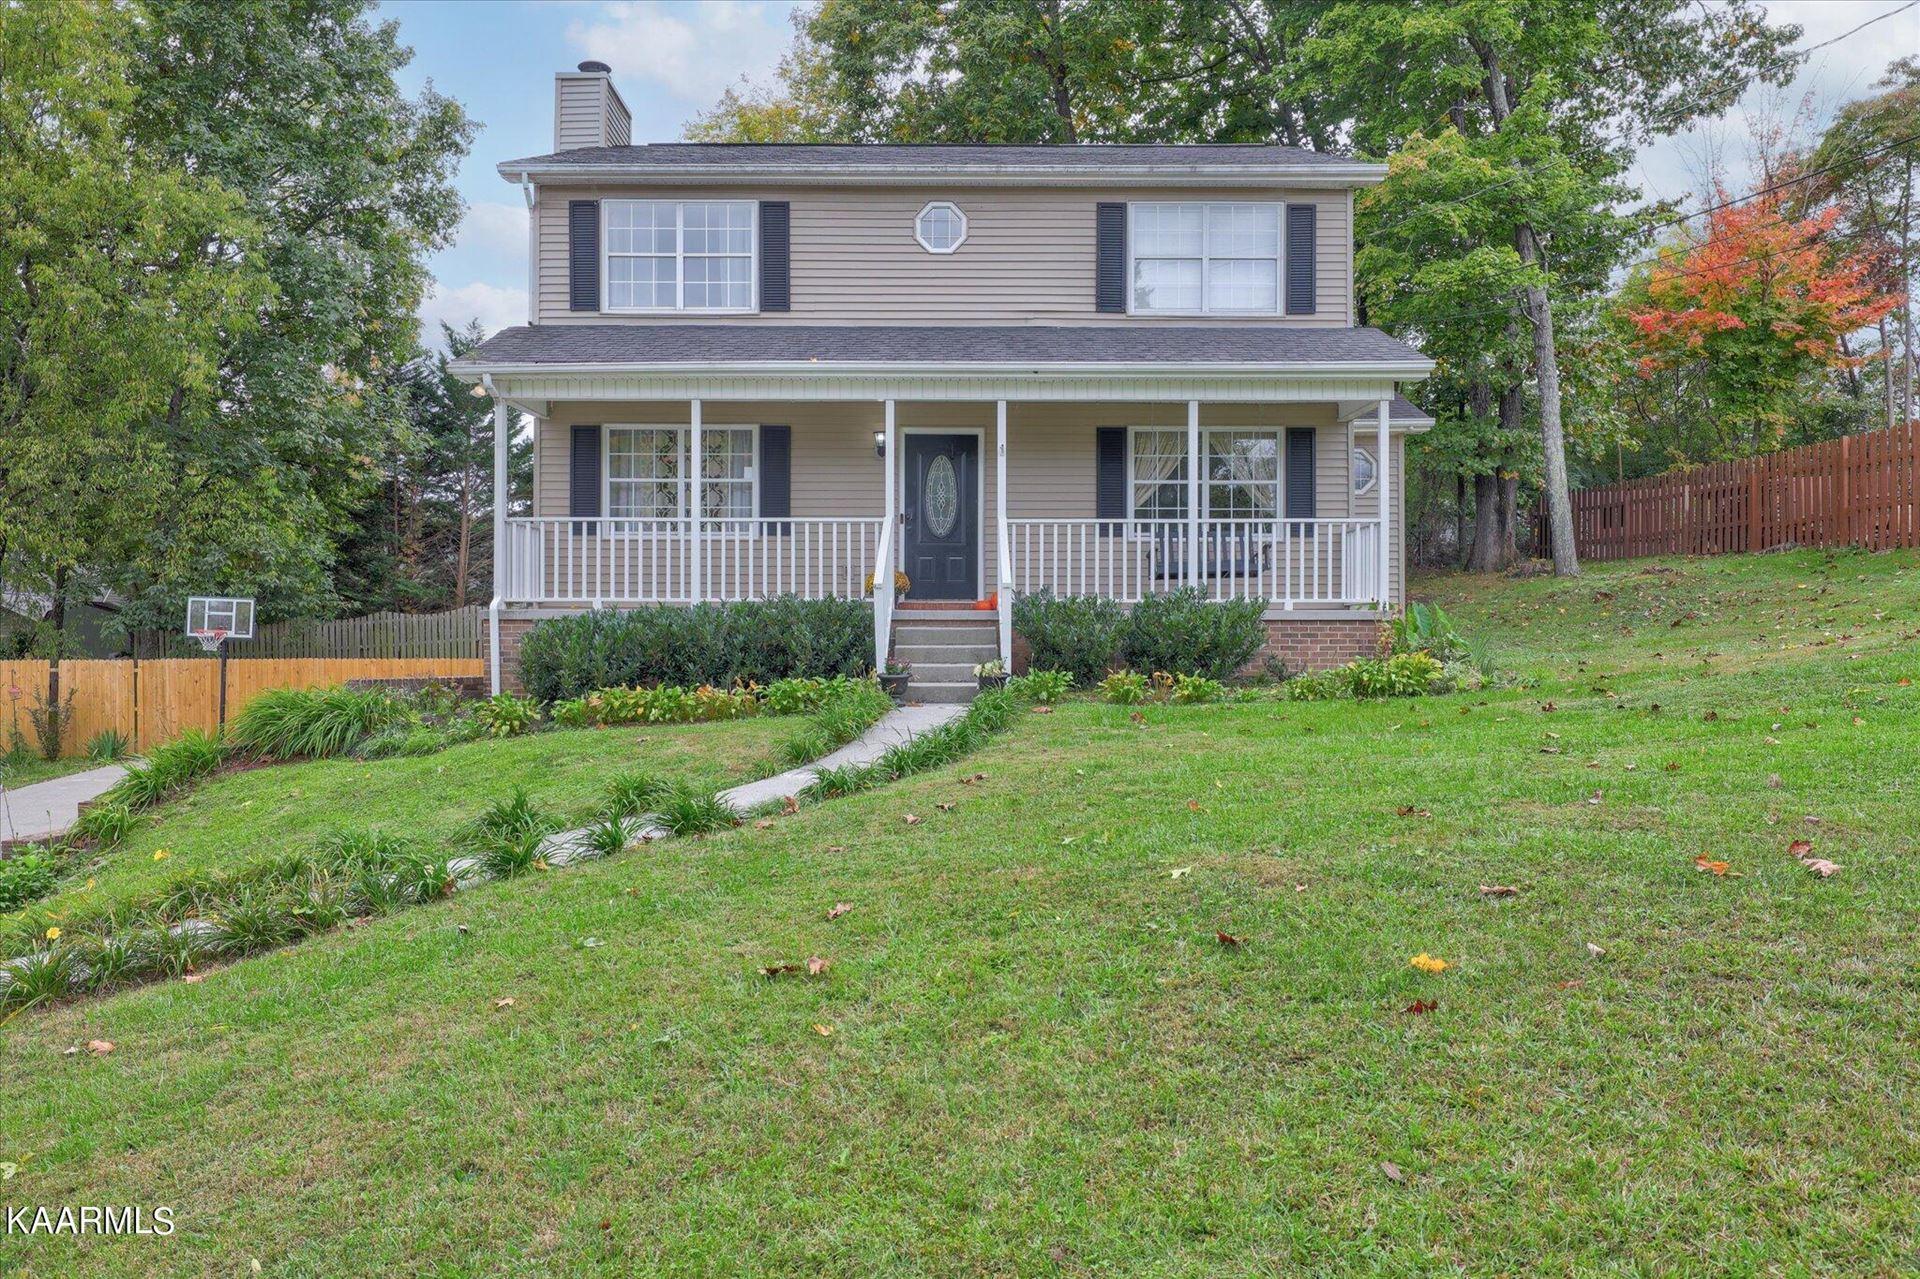 Photo of 10008 Cedar Croft Circle, Knoxville, TN 37932 (MLS # 1171758)